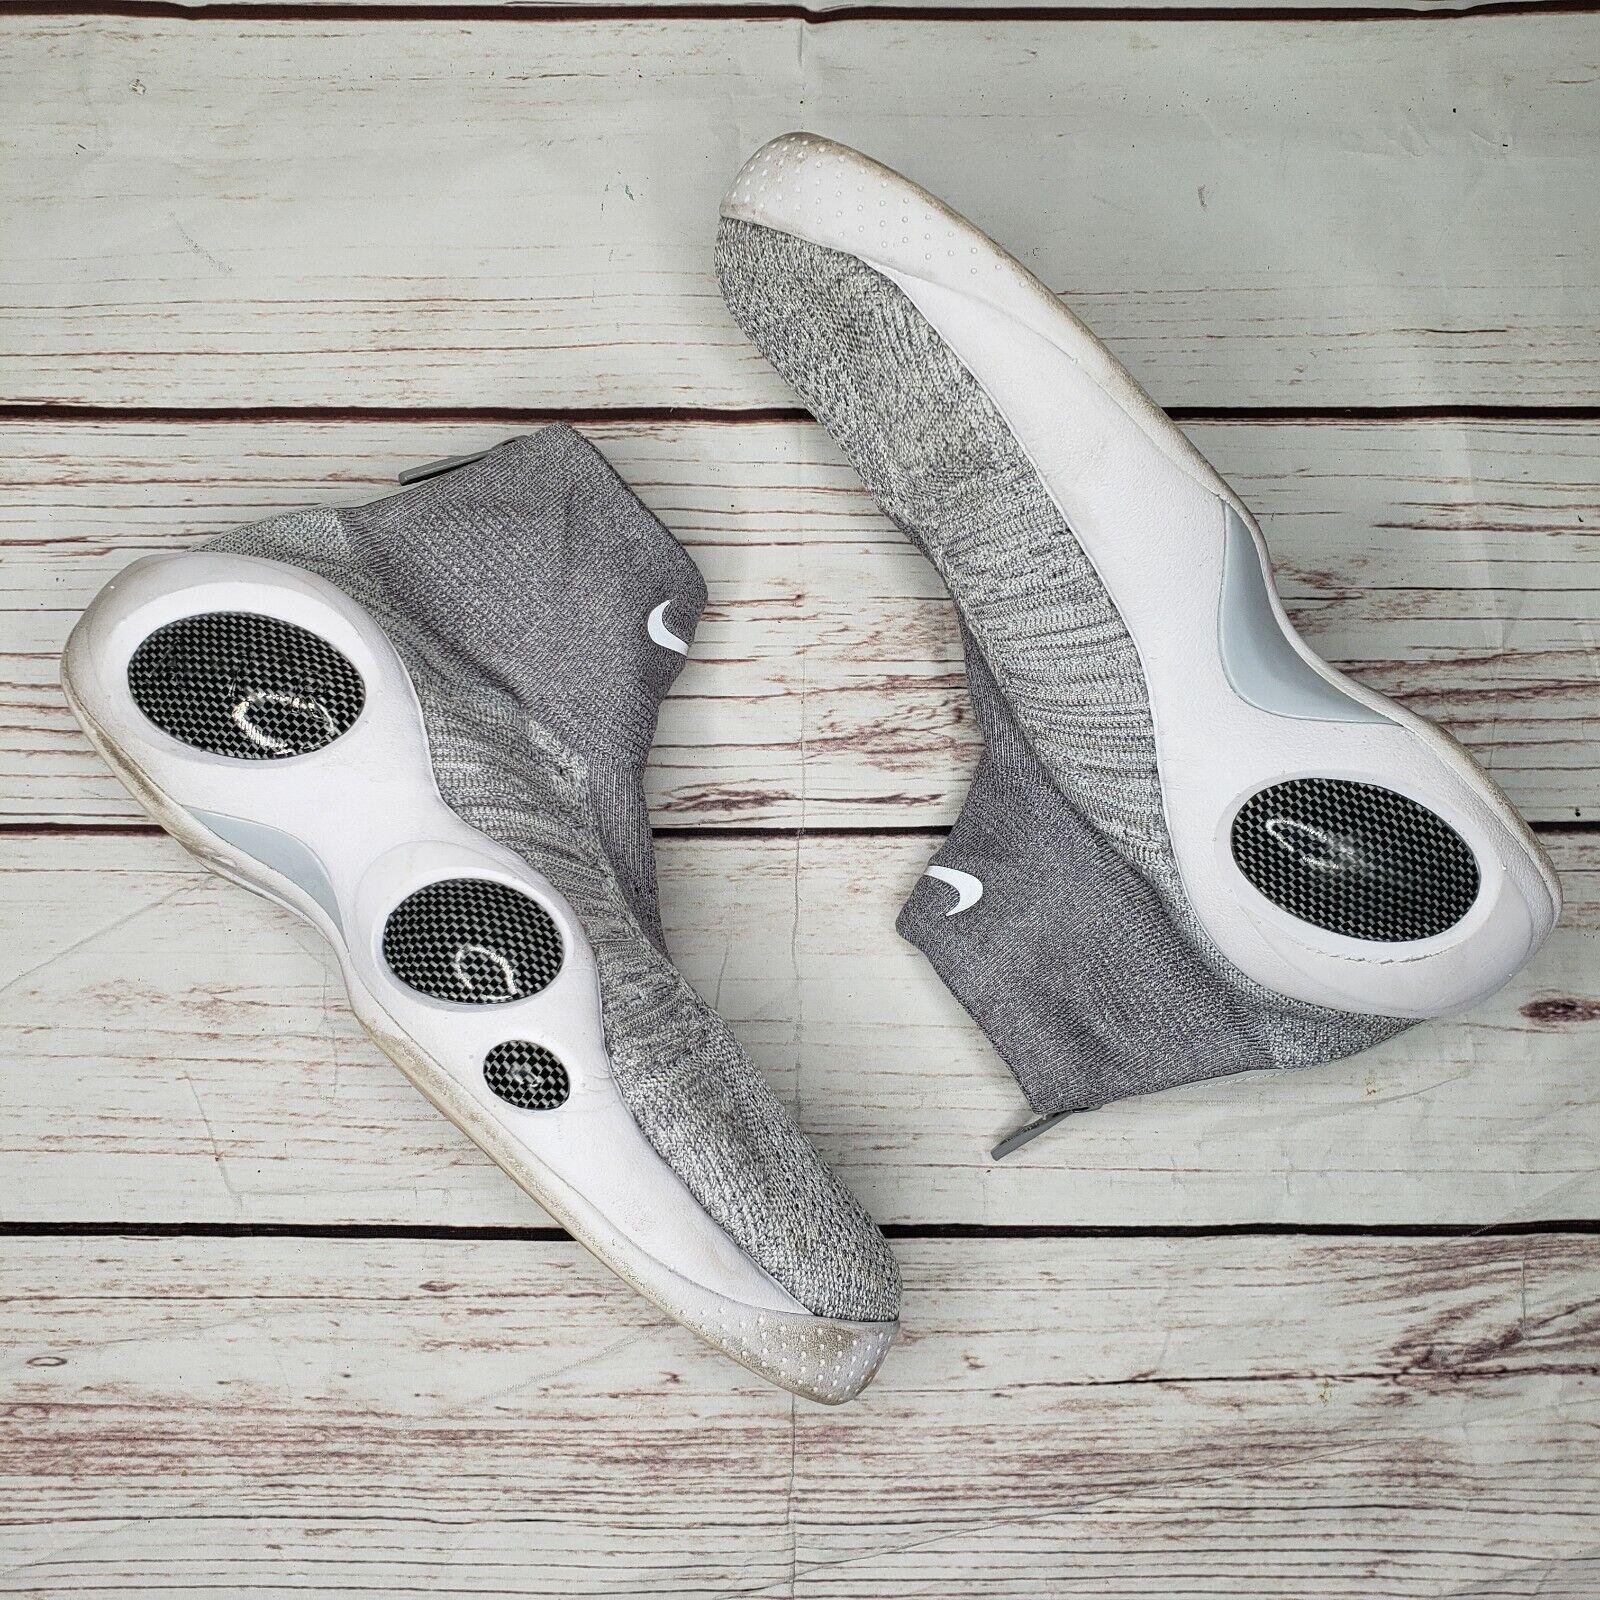 NIKE Flight Bonafide Jason Kidd shoes Cool Grey Platinum 917742-002 MENS SZ 9.5